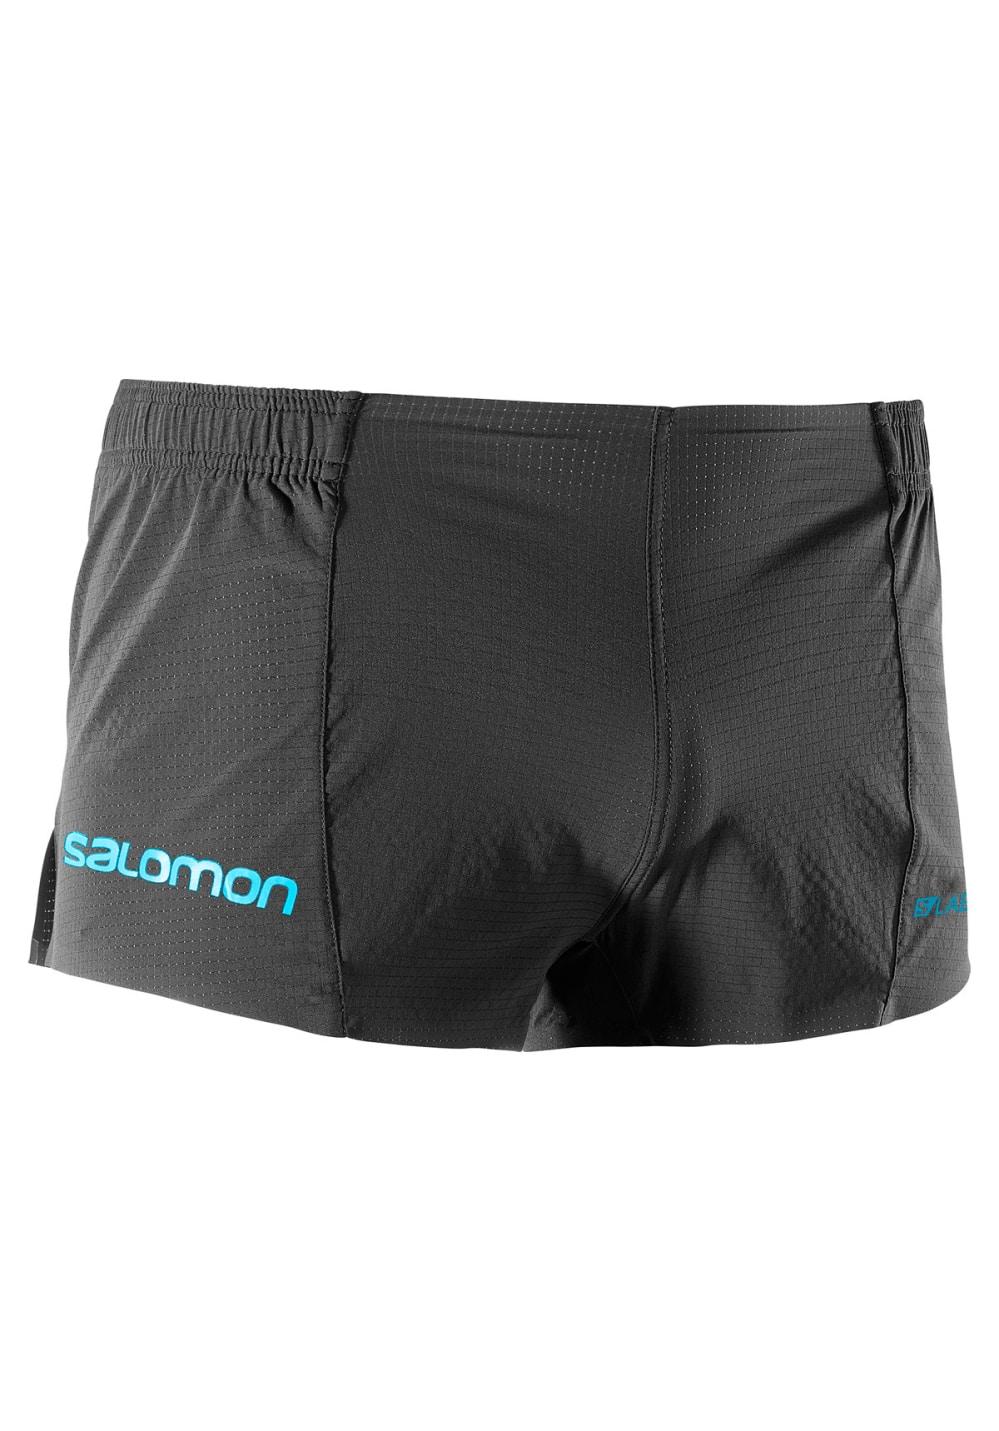 512bbfd0 Salomon S-Lab Short 4 - Running trousers for Men - Black